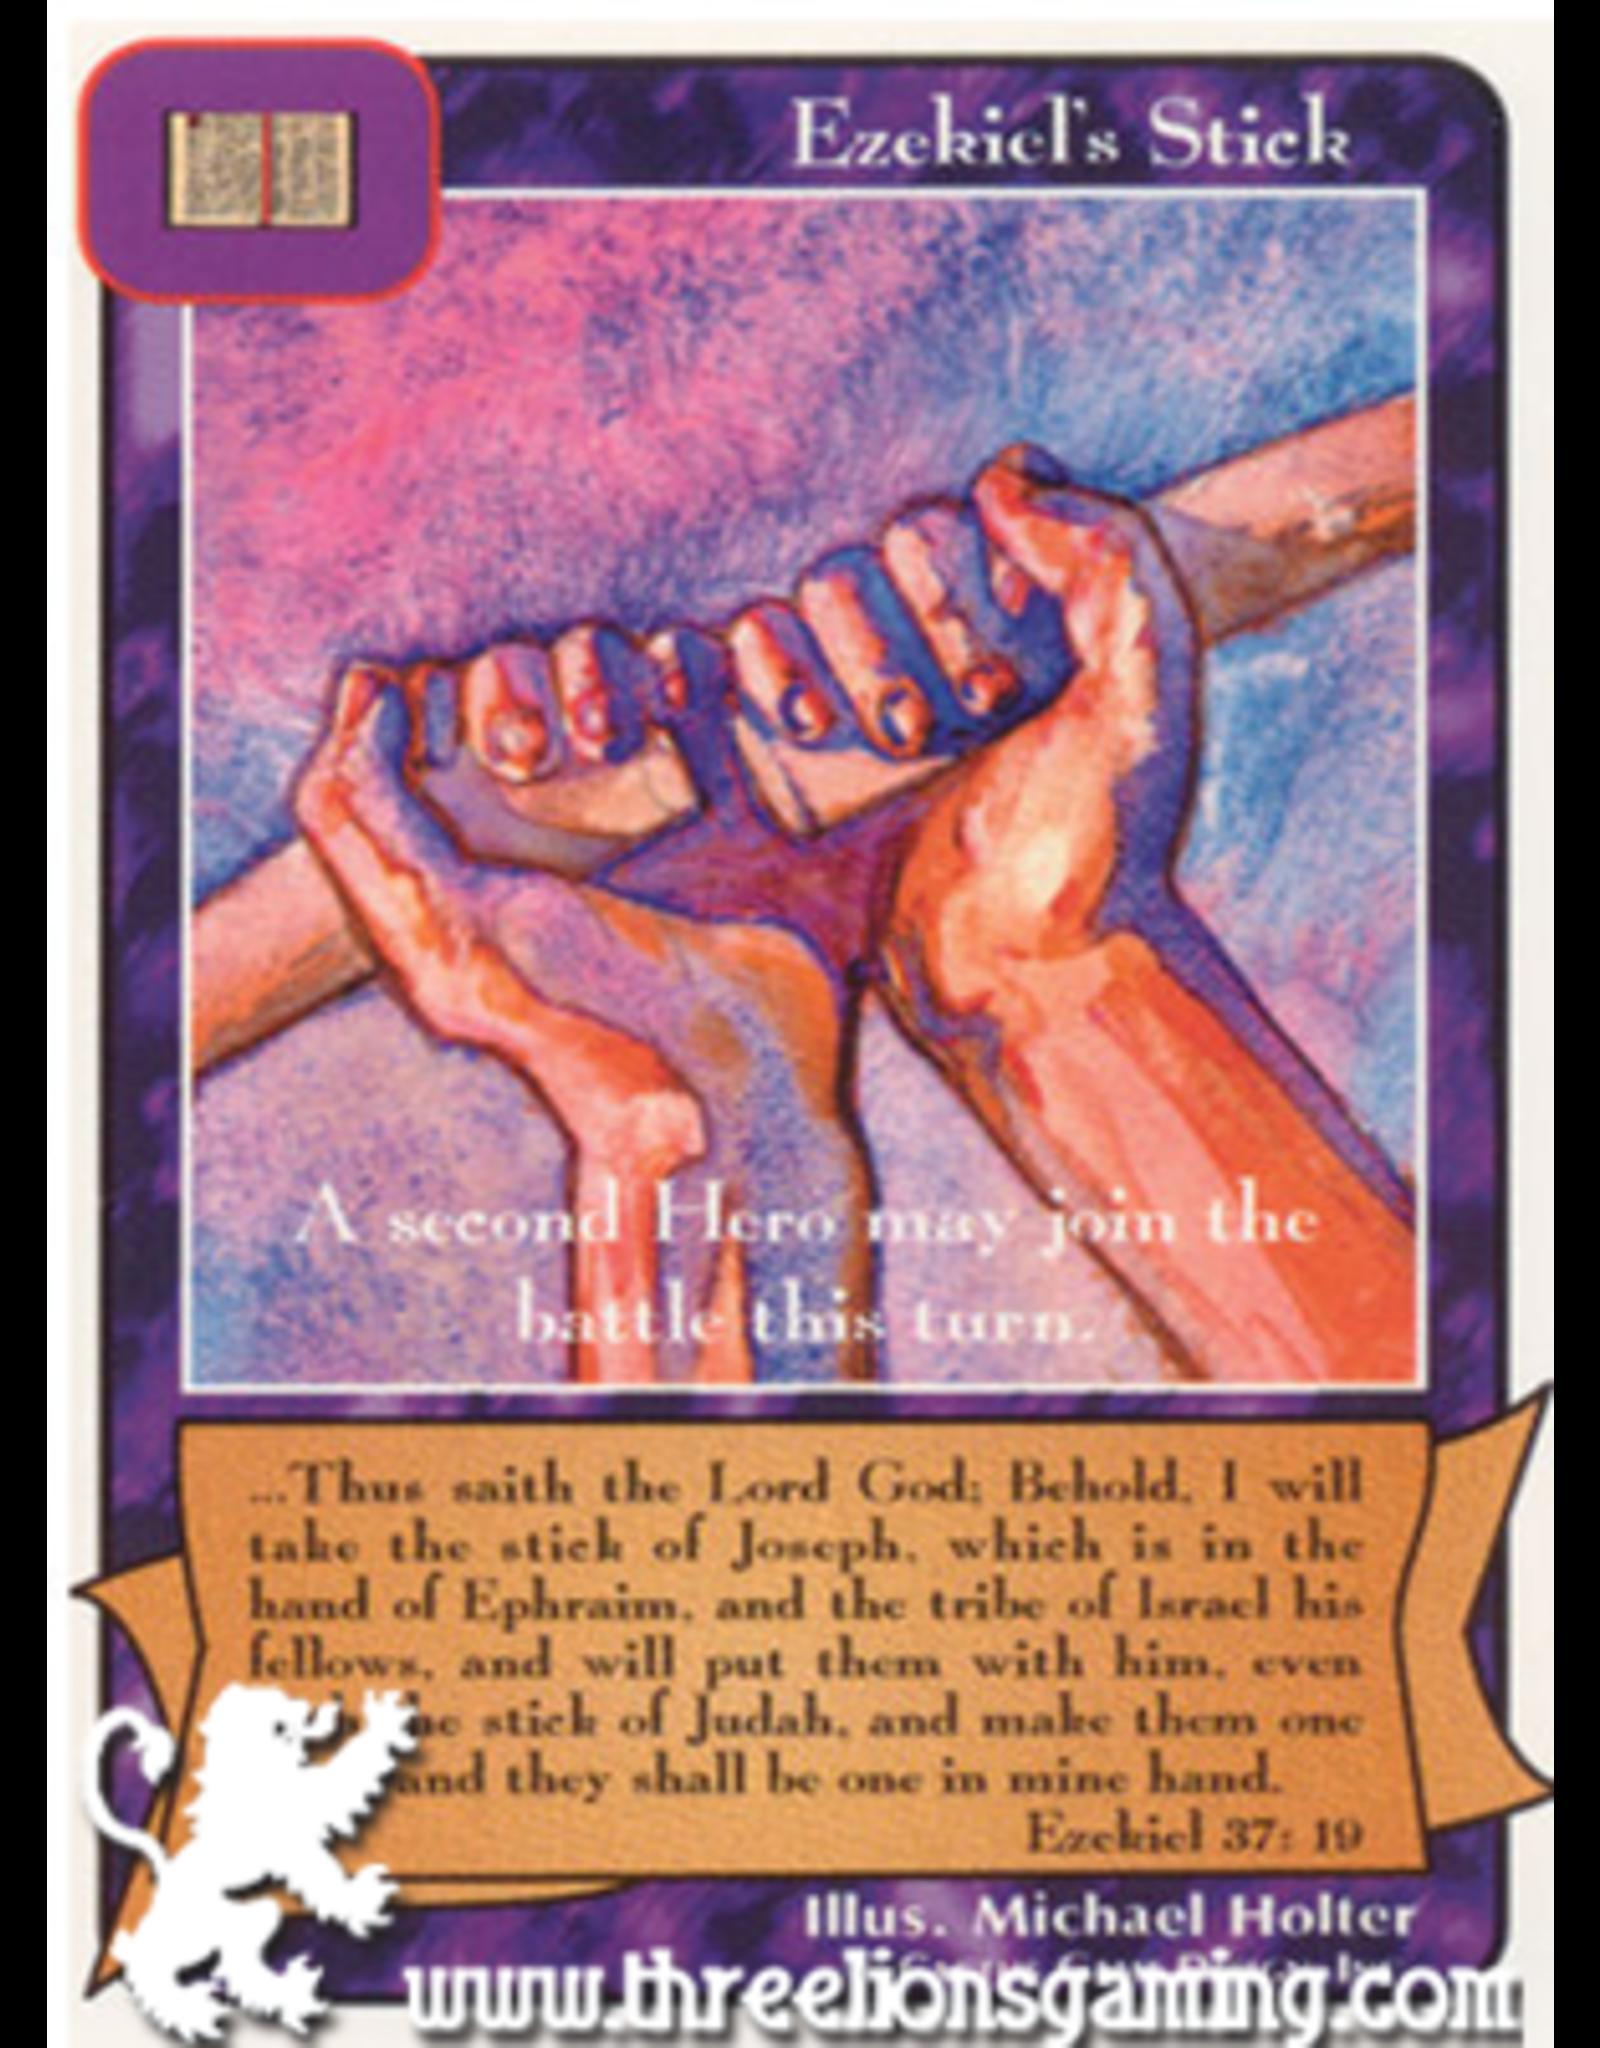 Orig: Ezekiel's Stick